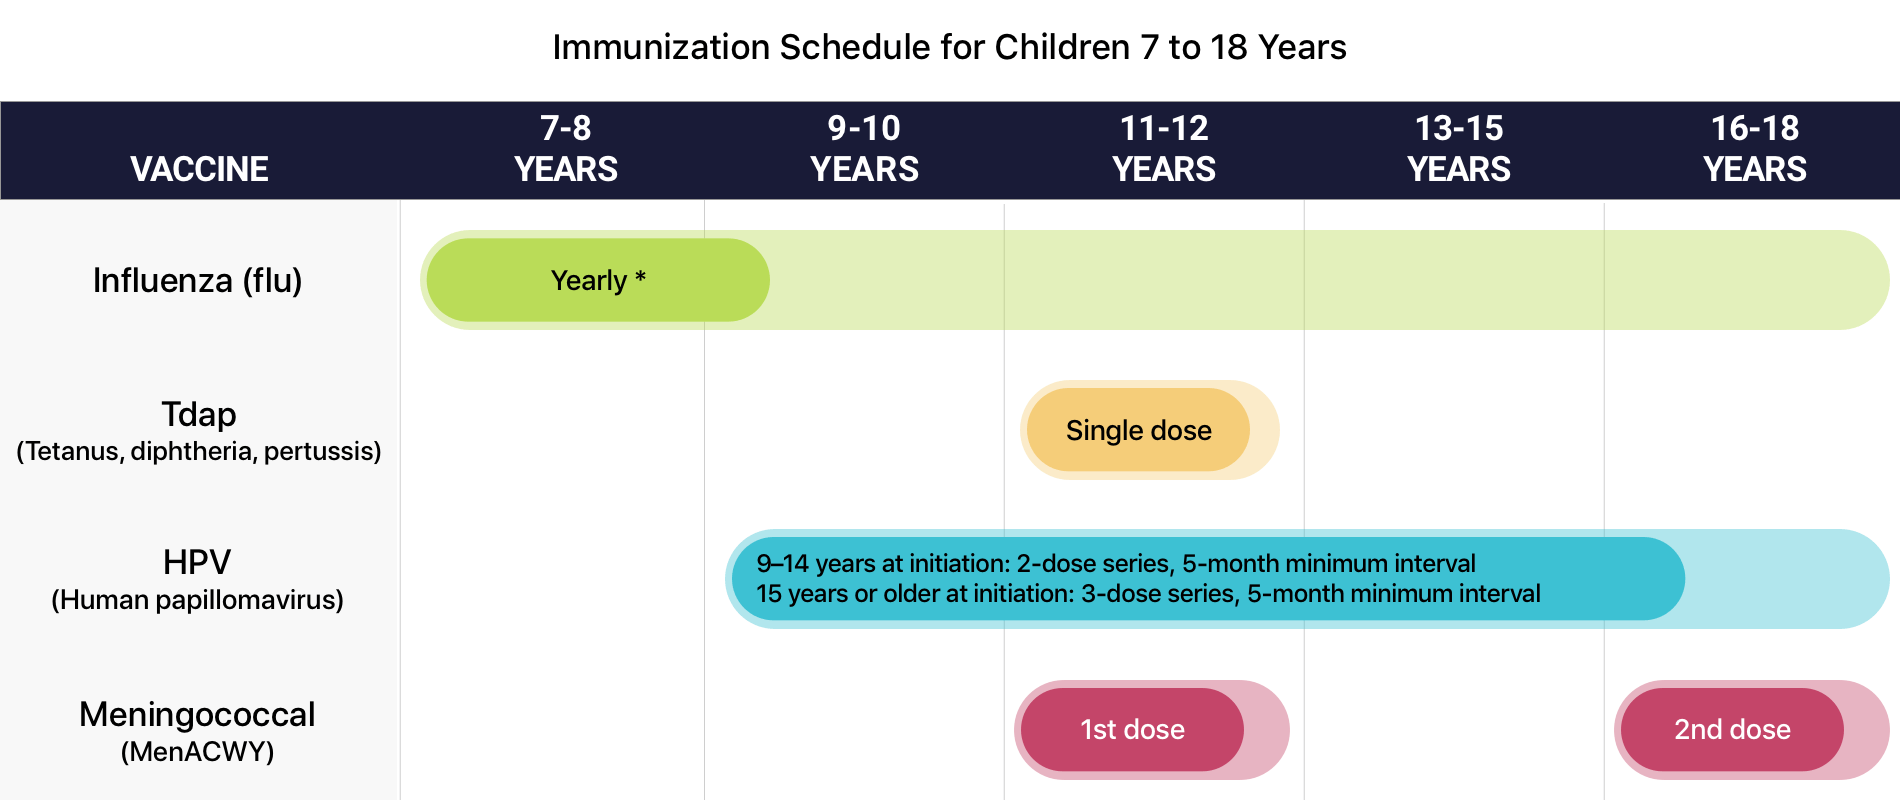 hpv vaccine cdc schedule)